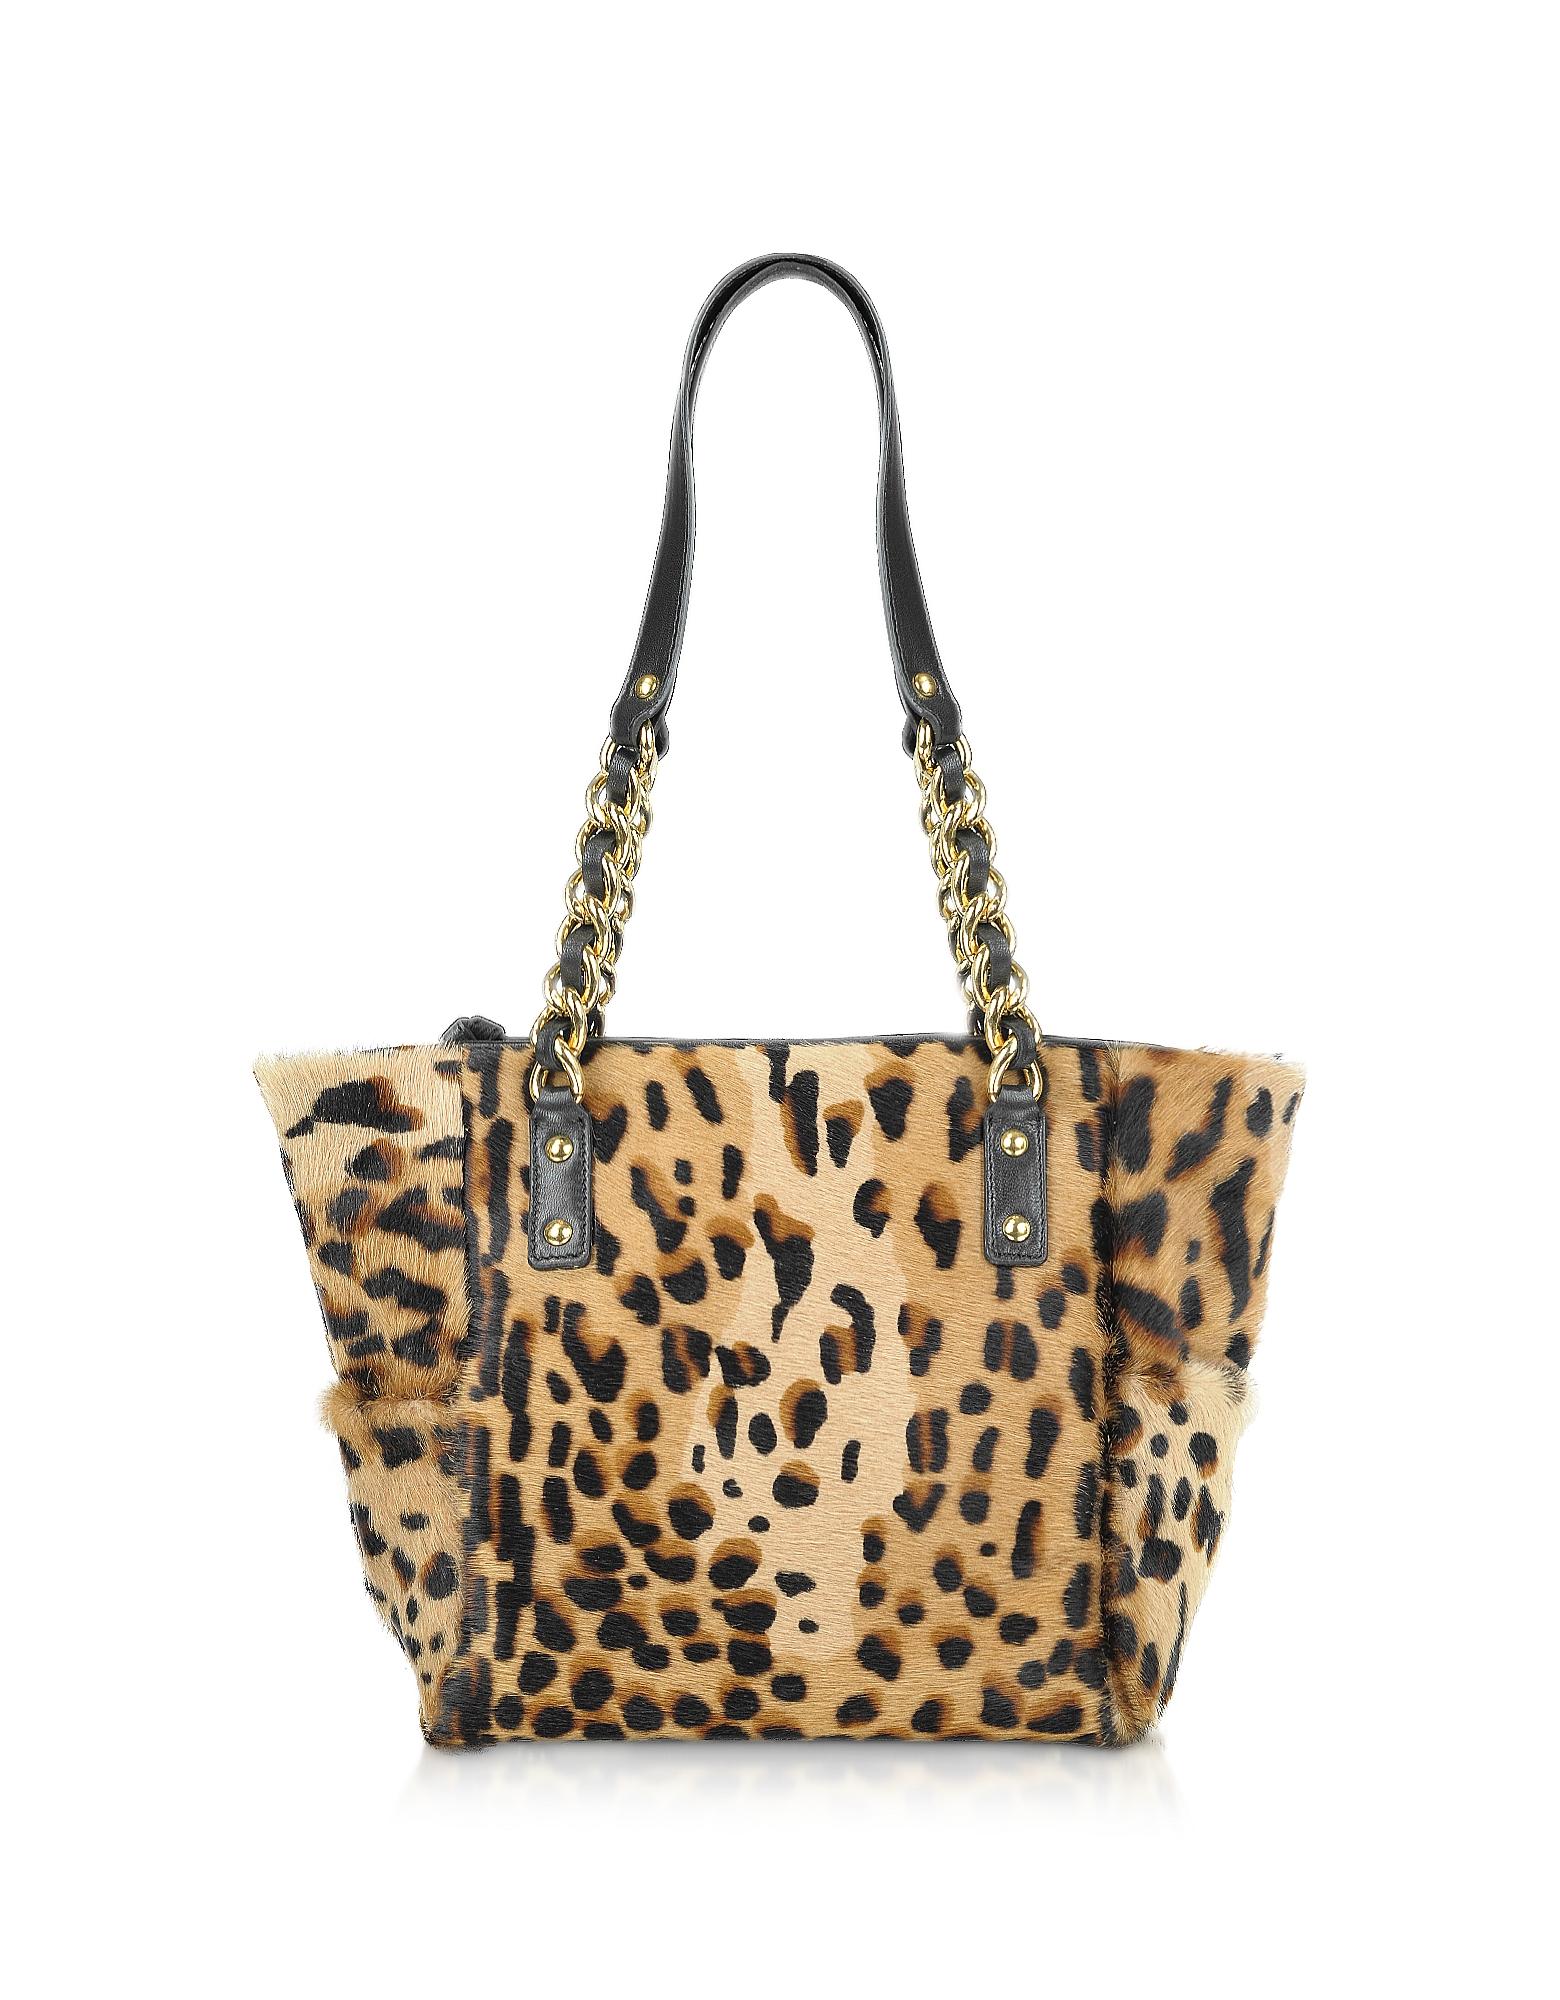 Fontanelli Handbags, Calfhair Leopard Print Mini Tote